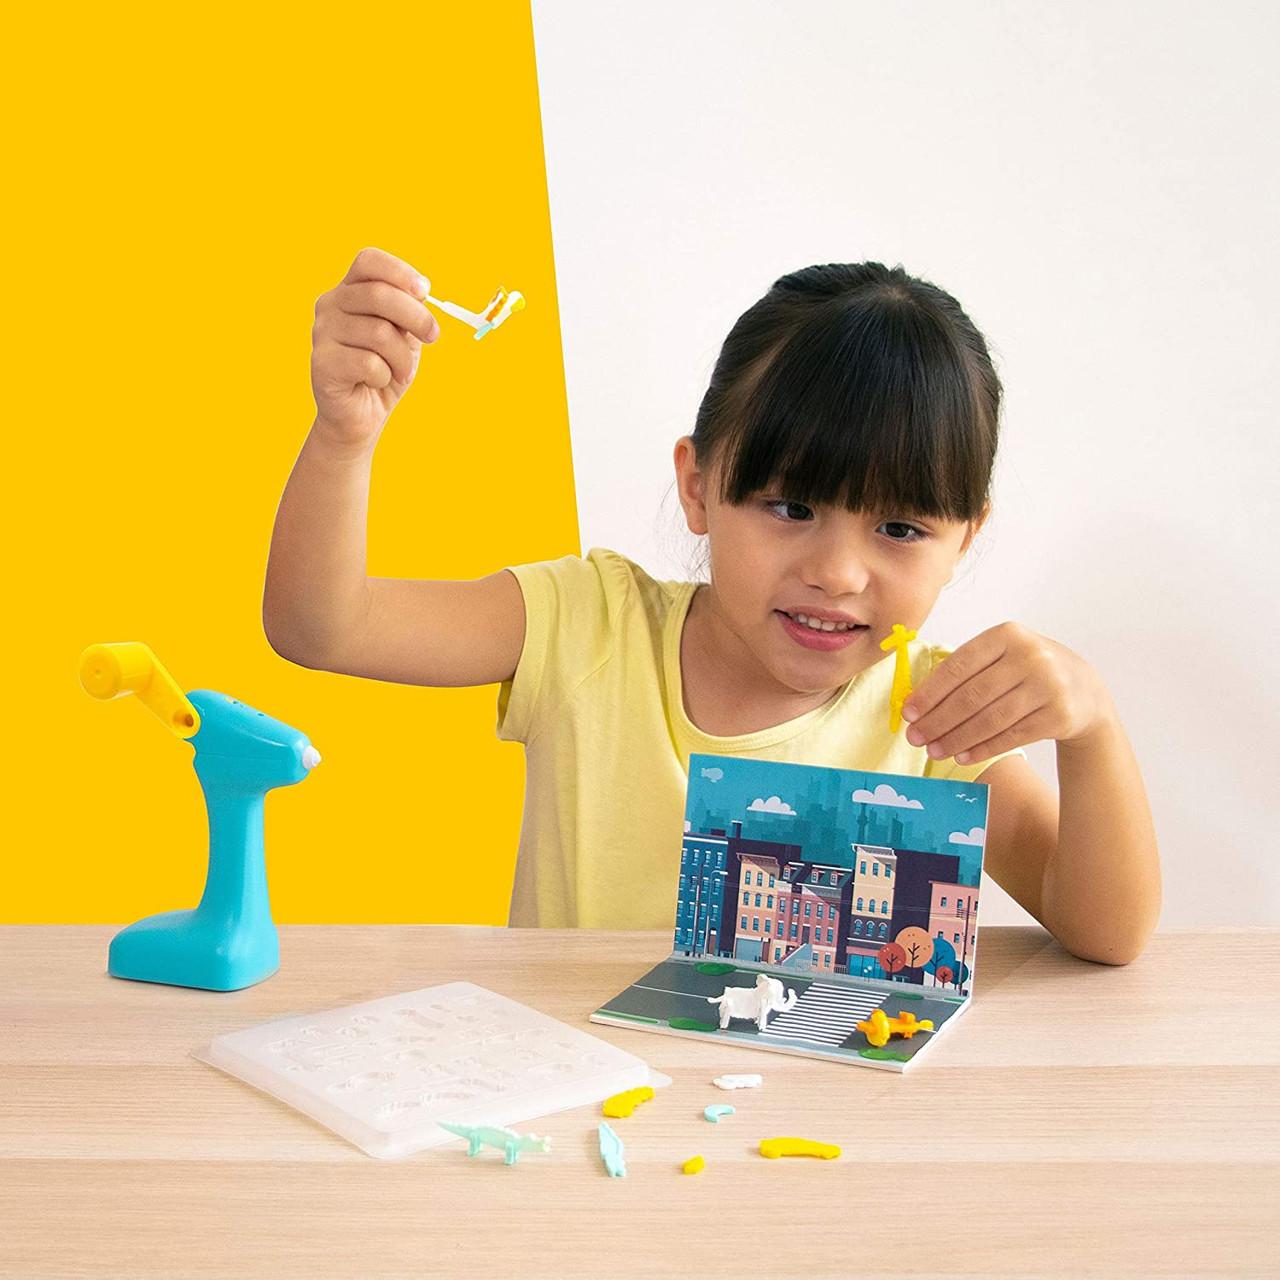 3Doodler 0JPSJUBE1R-B1 3D Build and Play 3D Printing Pen Bundle 4 Refill Kits